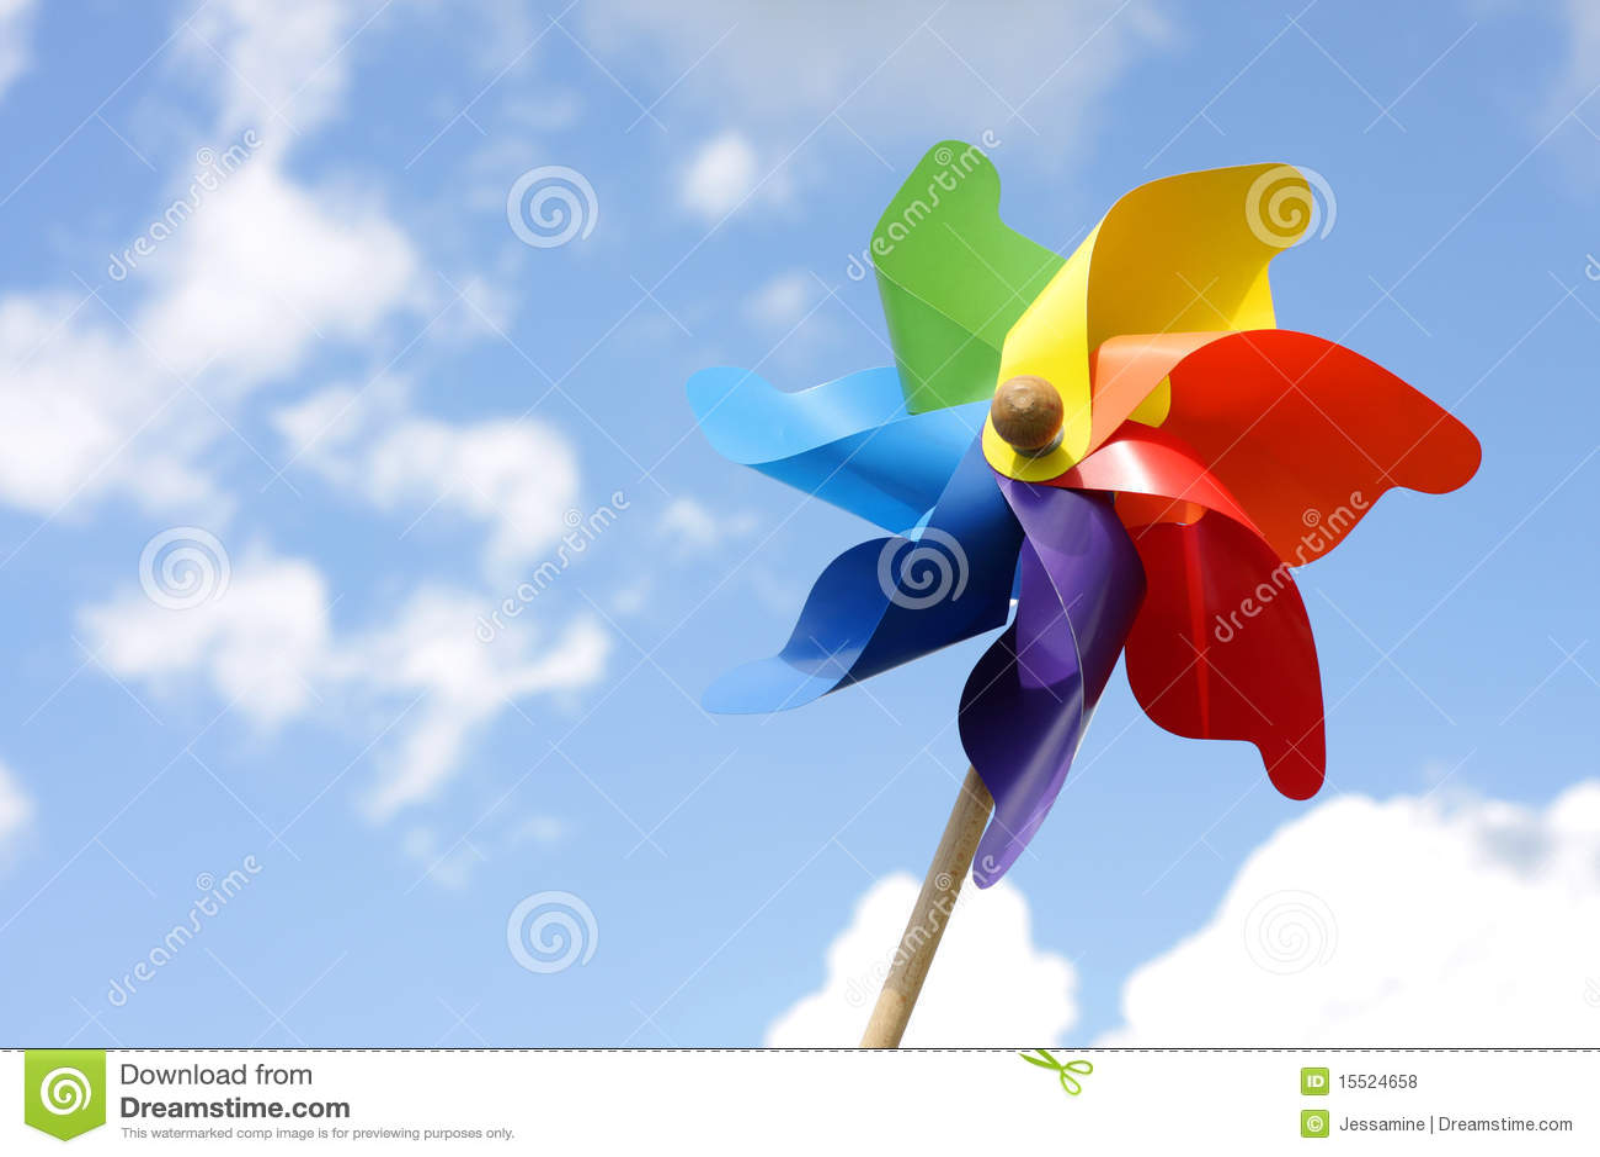 windmill toy stock photo  image of turn  pinwheel  summer